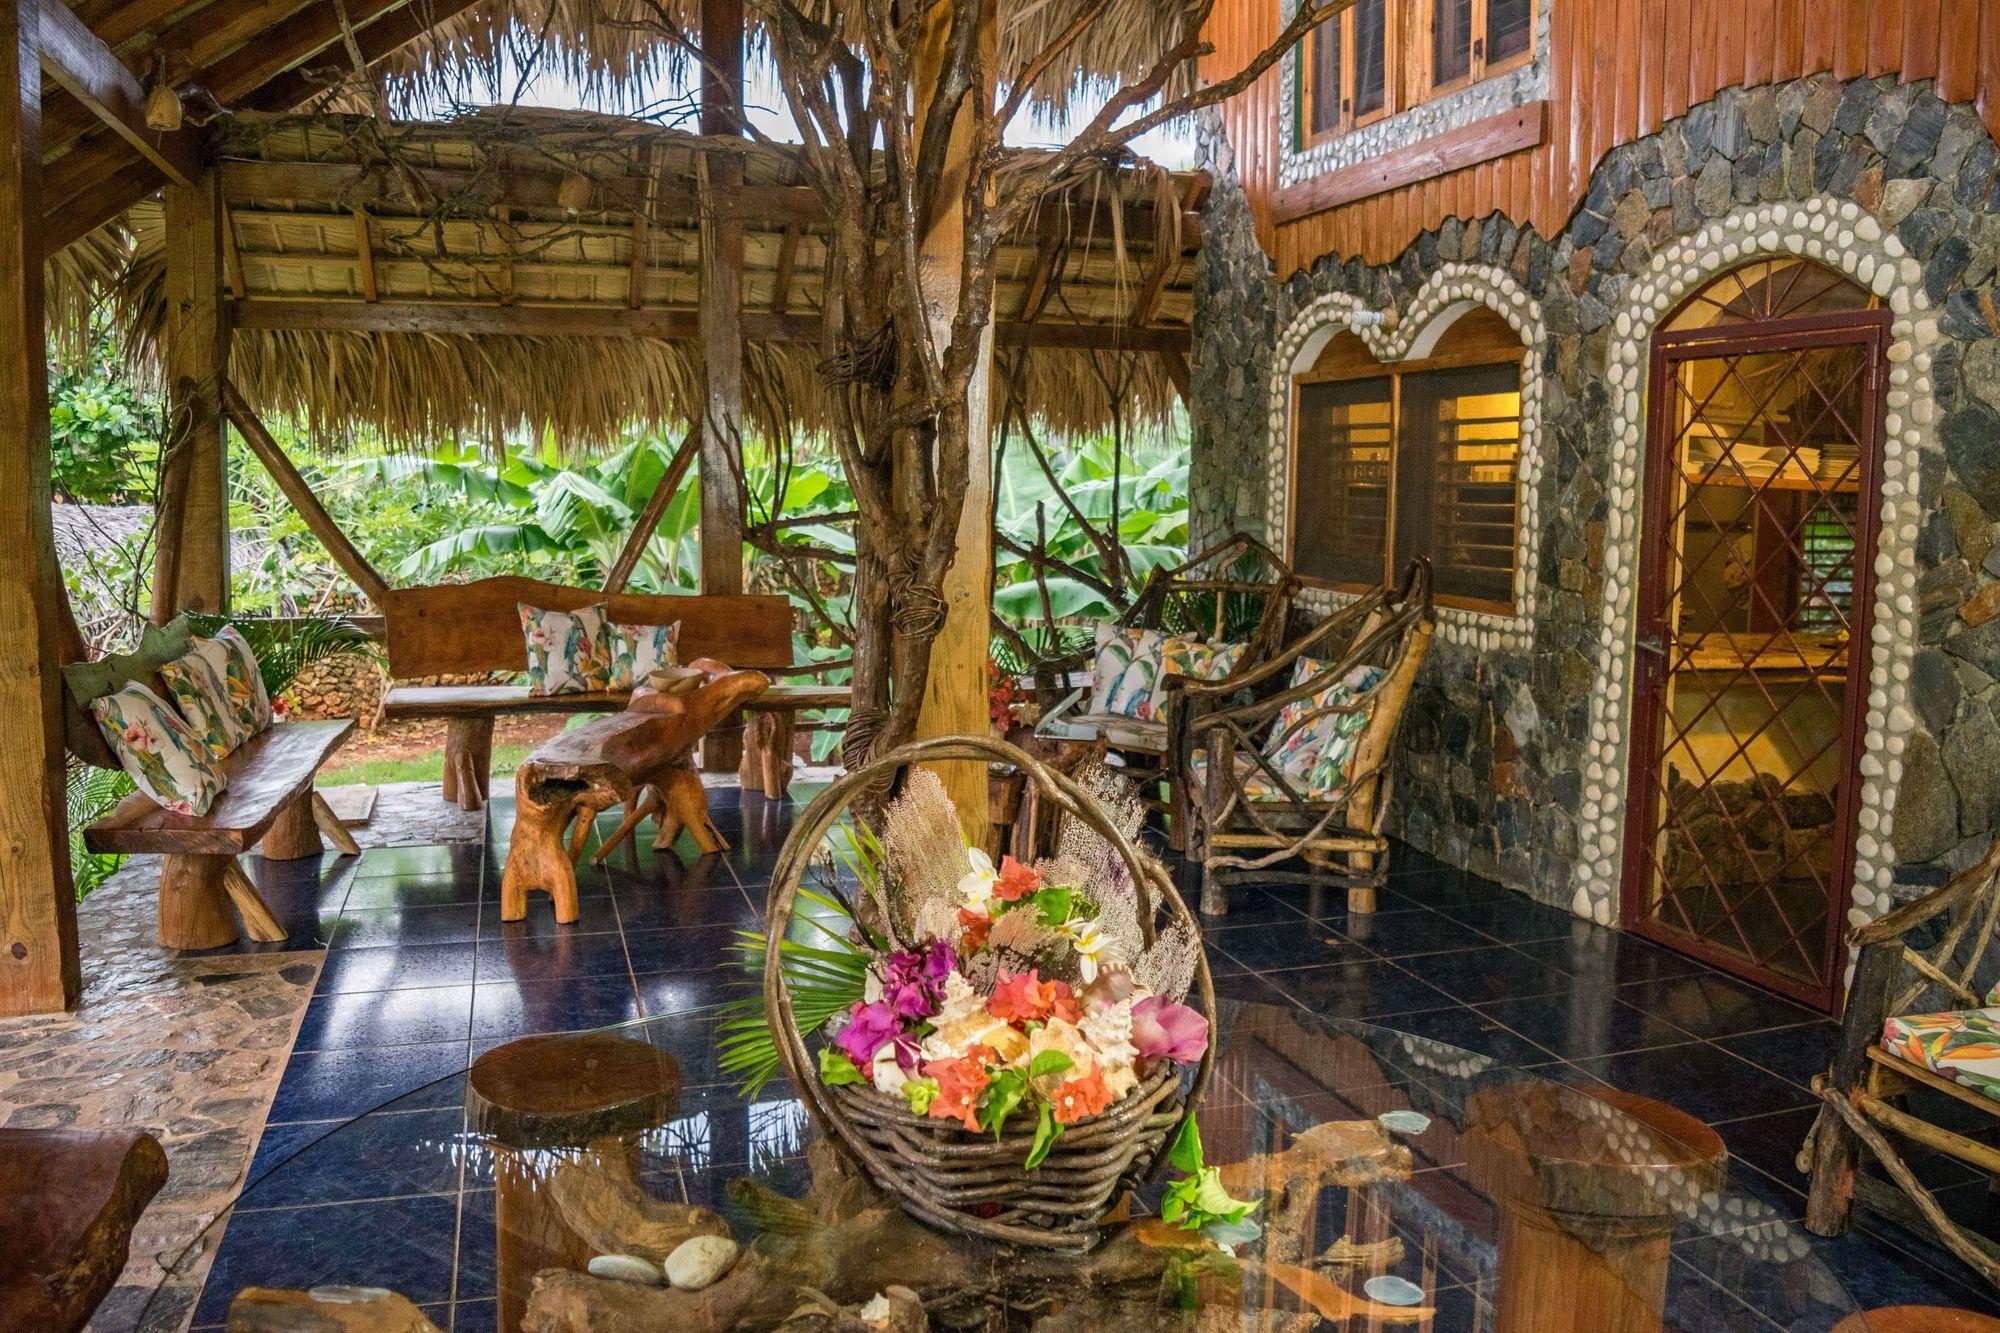 Tropical and rustic | Rustic wedding details, Tropical ... |Tropical Rustic Decor